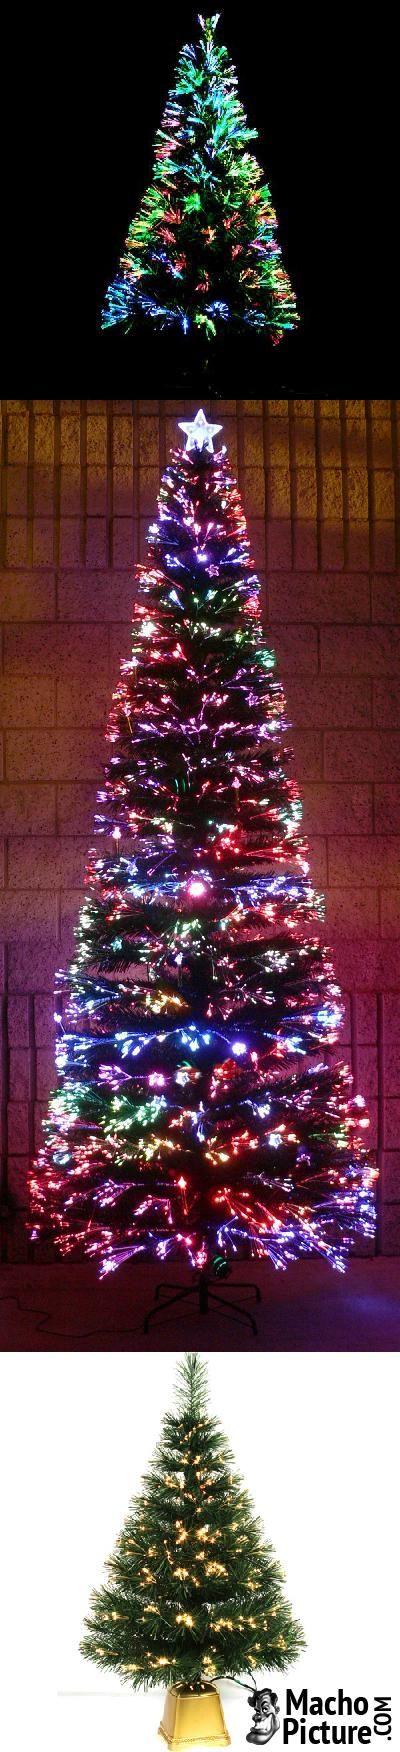 Fiber optic christmas tree - 4 PHOTO!